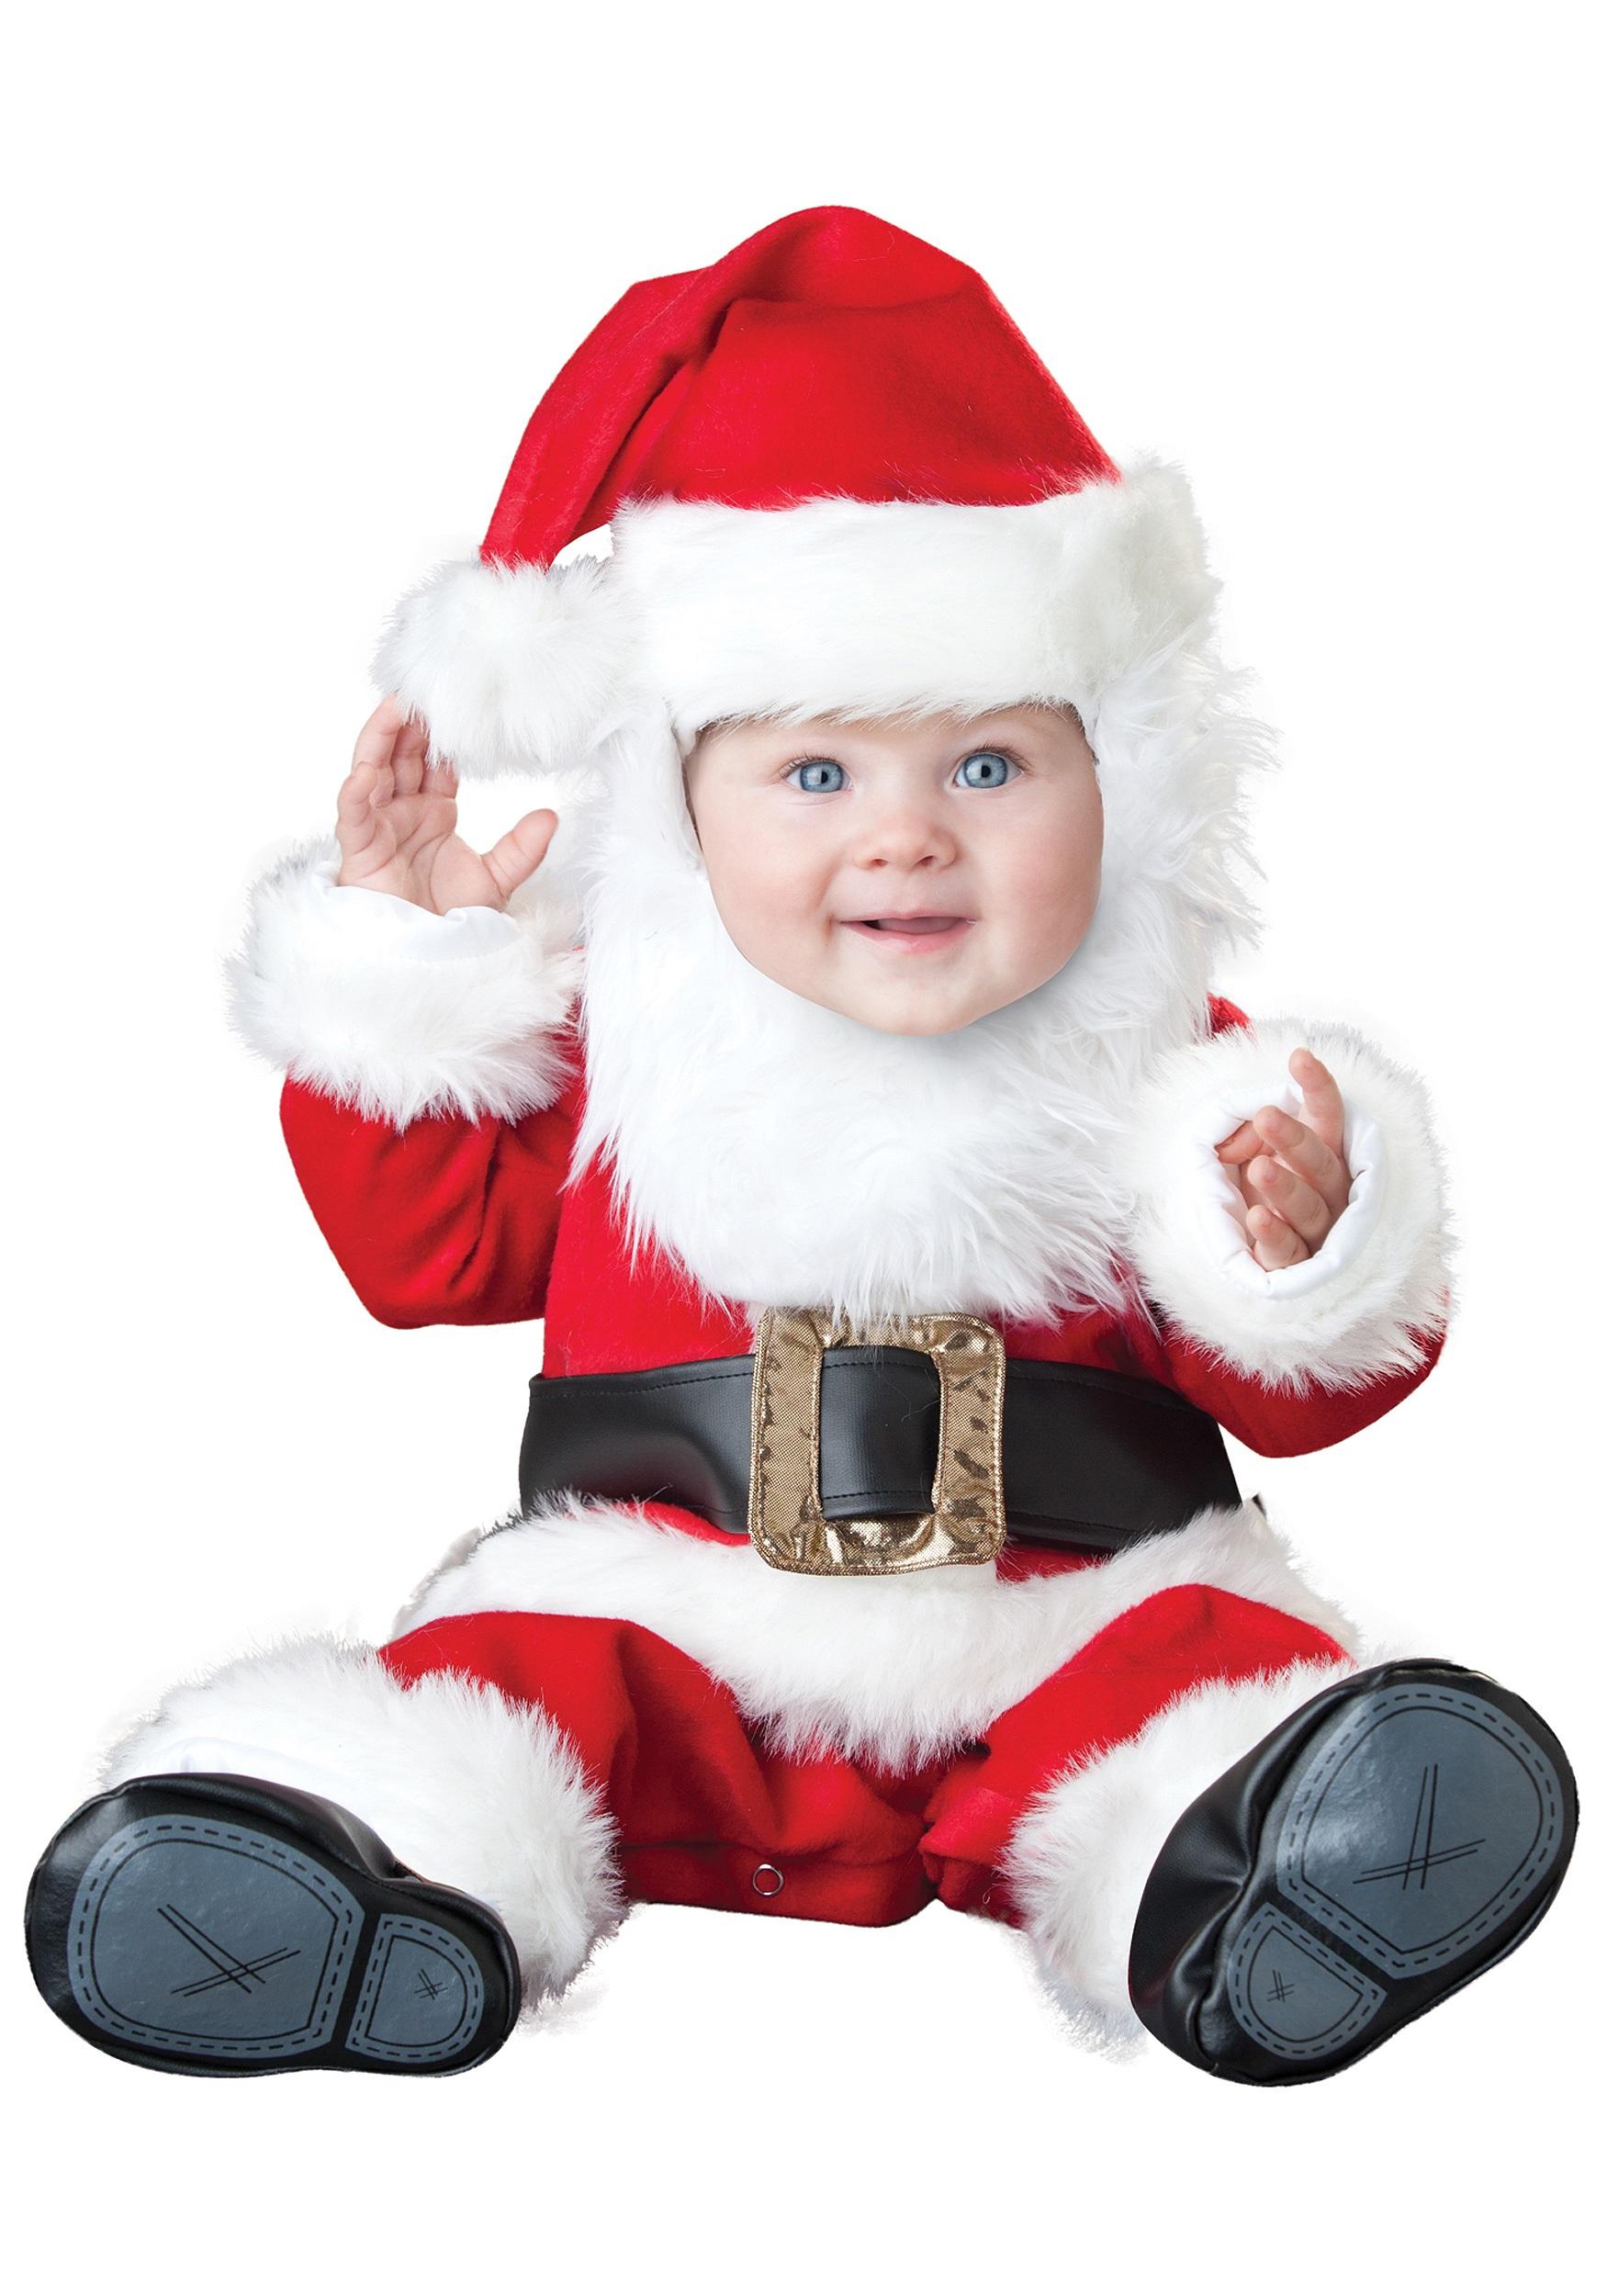 Cute Pink Snowman Wallpaper Santa Claus Costumes For Kids Creative Costume Ideas